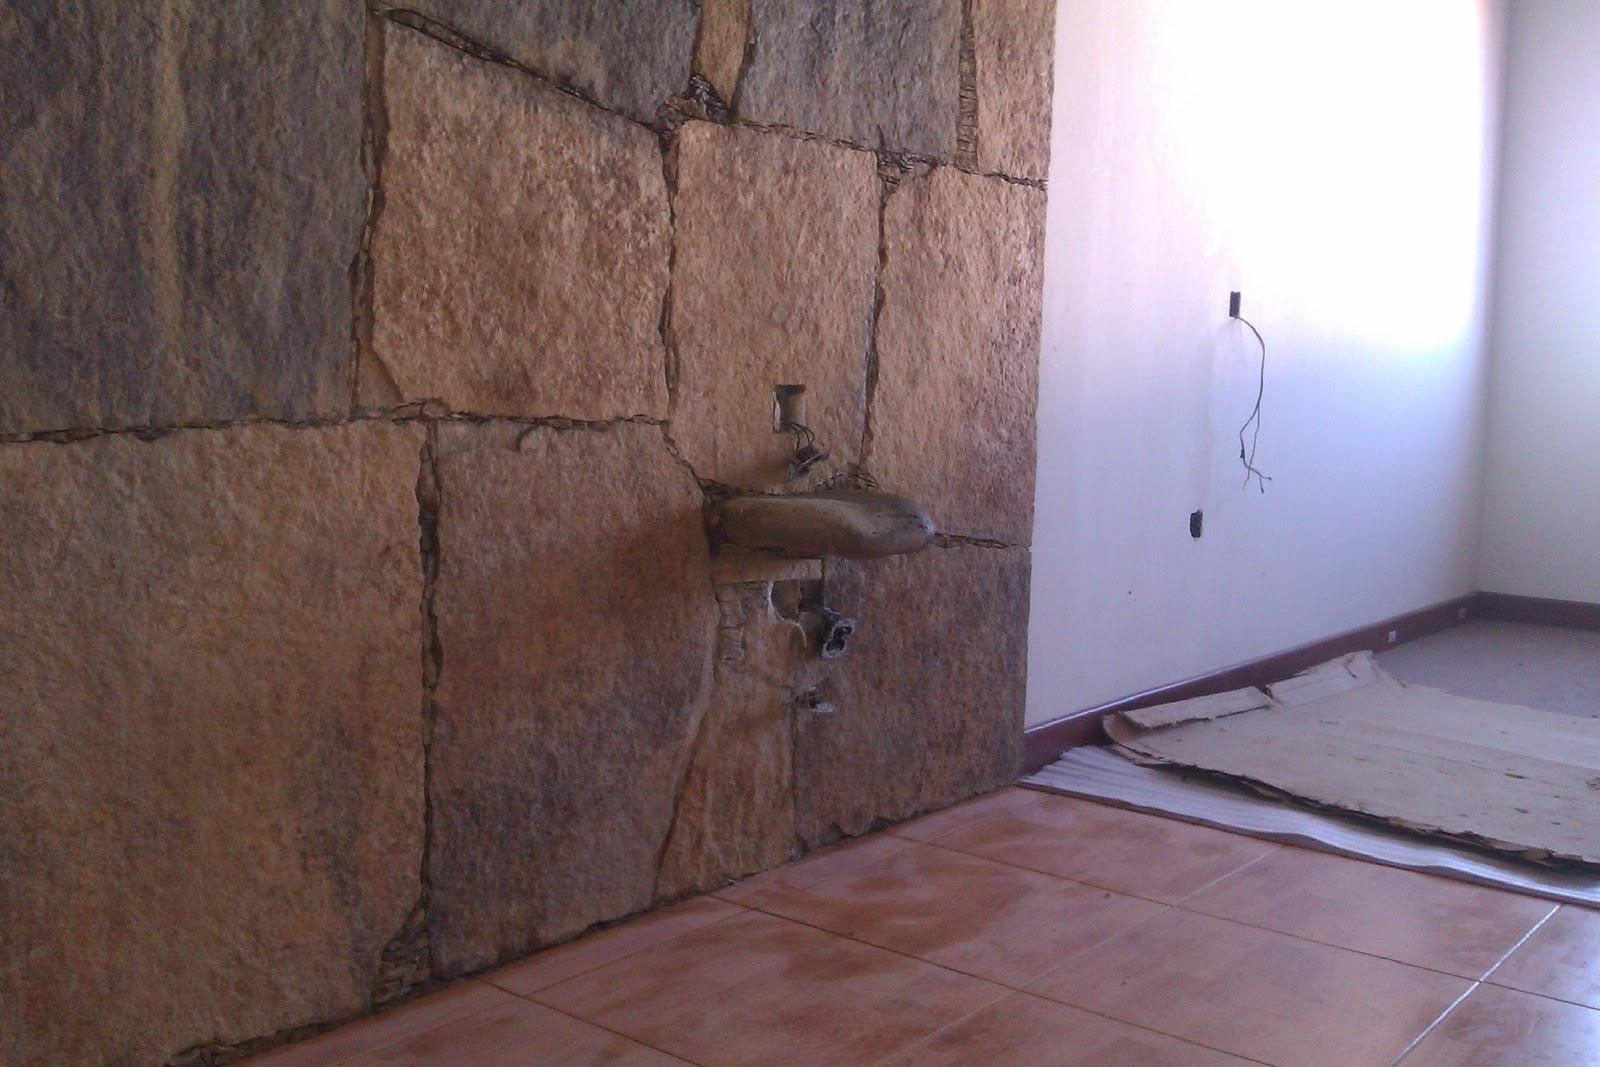 Artesania malage chapado piedra - Cabeceros de piedra ...